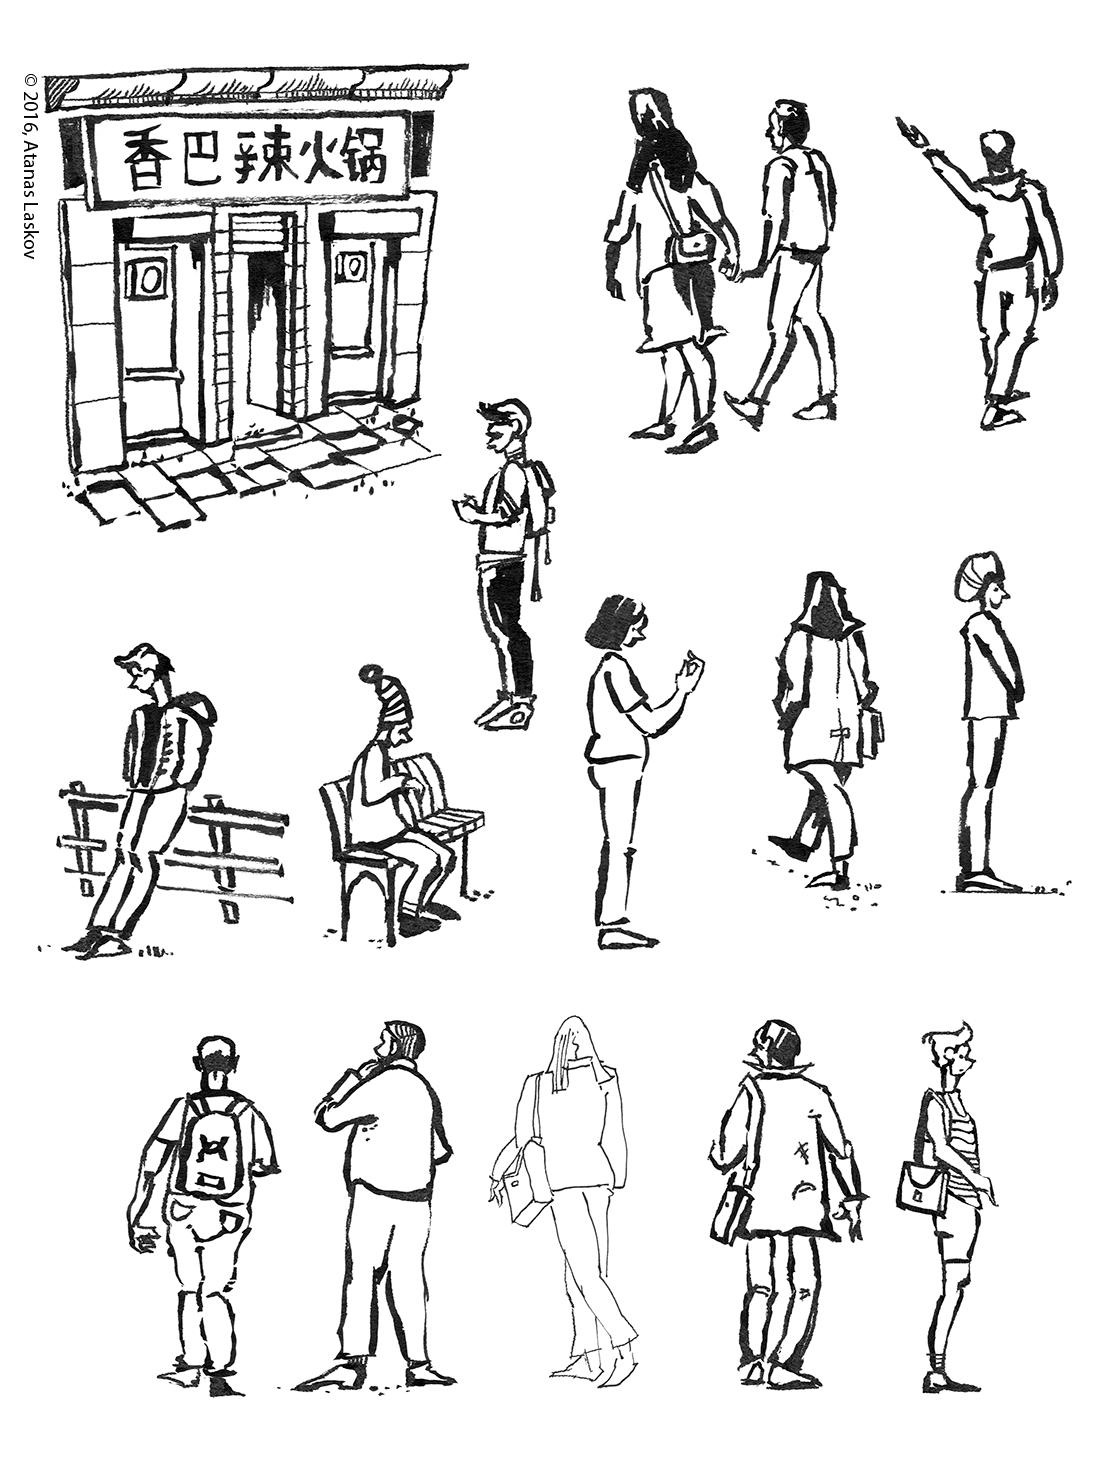 Laskov Urban Sketching